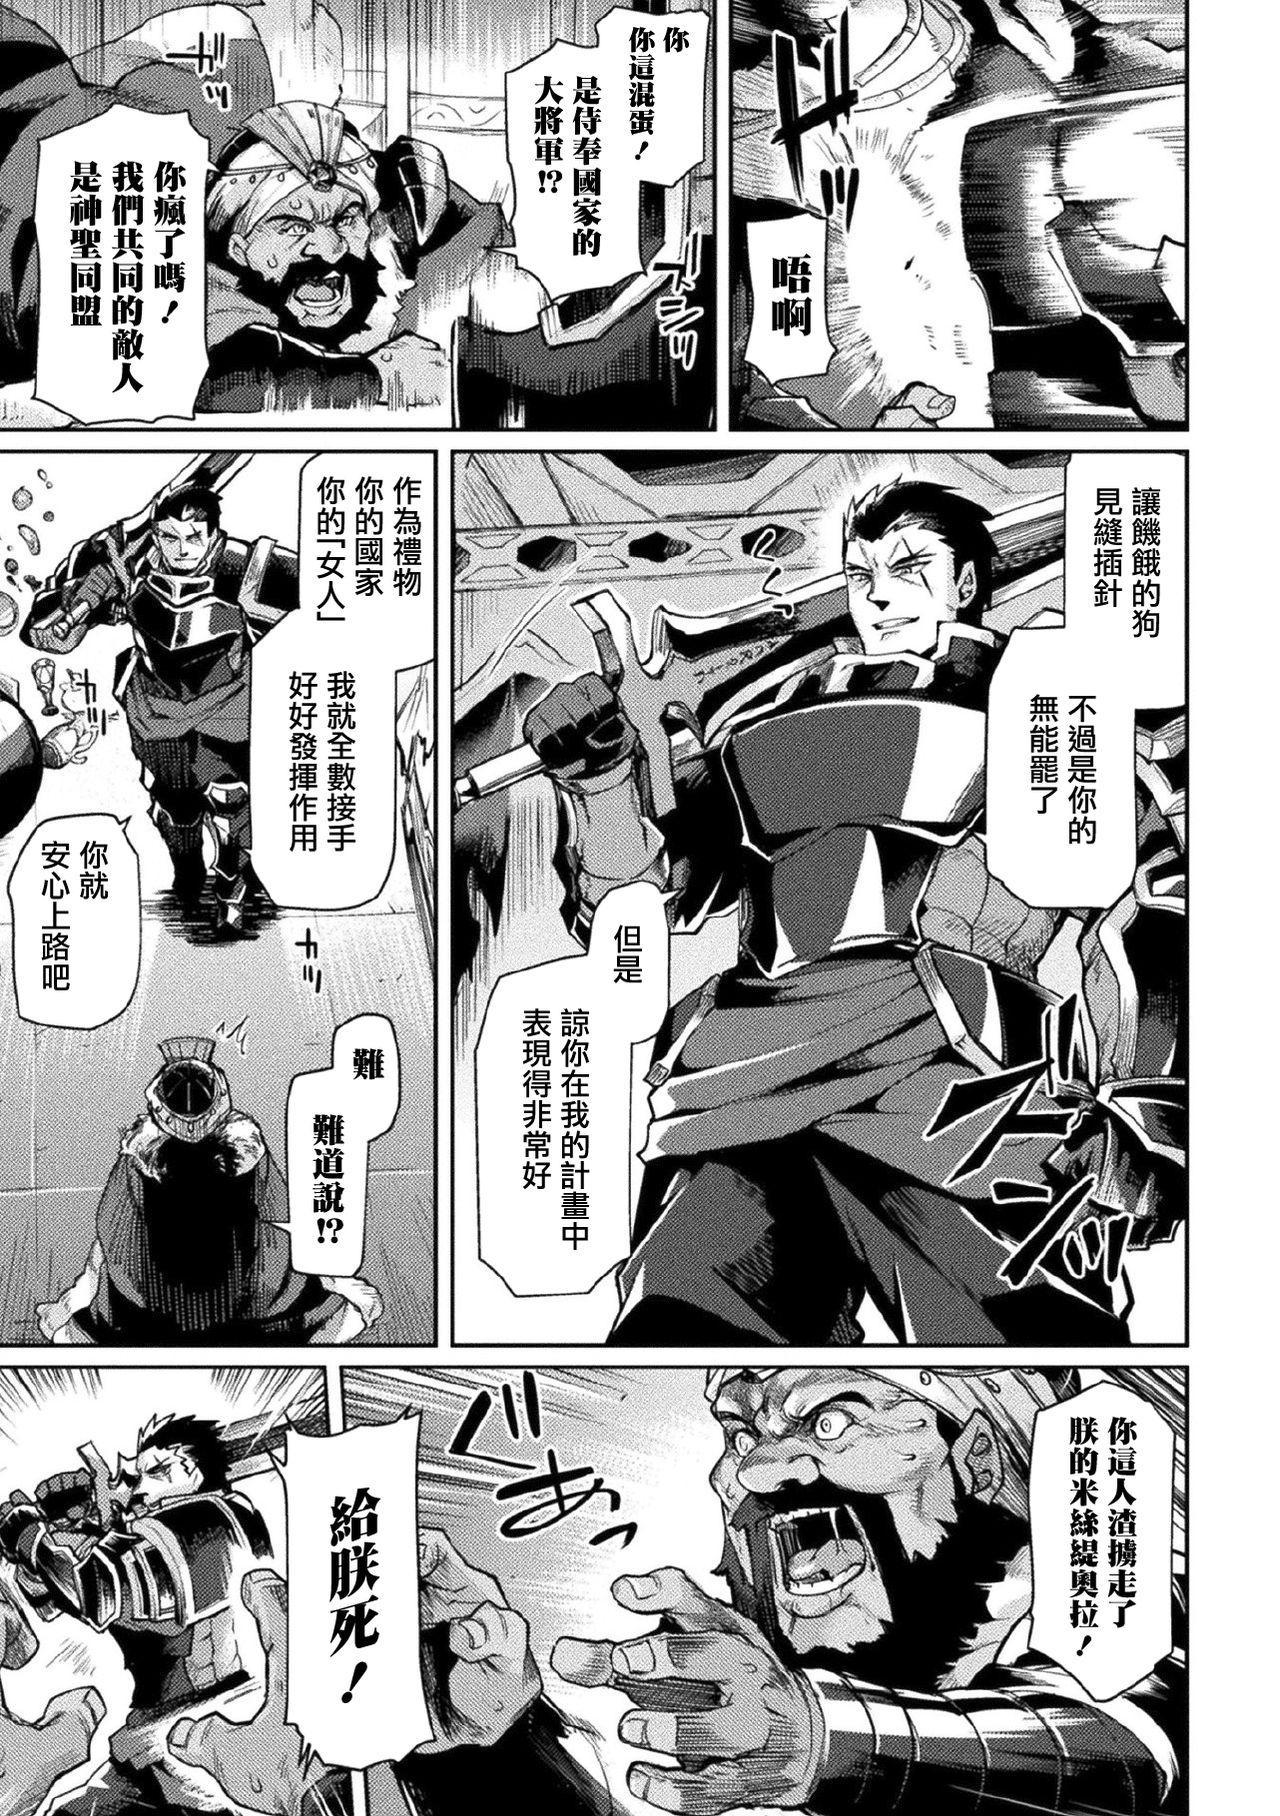 [Tsukitokage] Kuroinu II ~Inyoku ni Somaru Haitoku no Miyako, Futatabi~ THE COMIC Chapter 6 (Kukkoro Heroines Vol. 7) [Digital] [Chinese] [鬼畜王漢化組] [Digital] 21